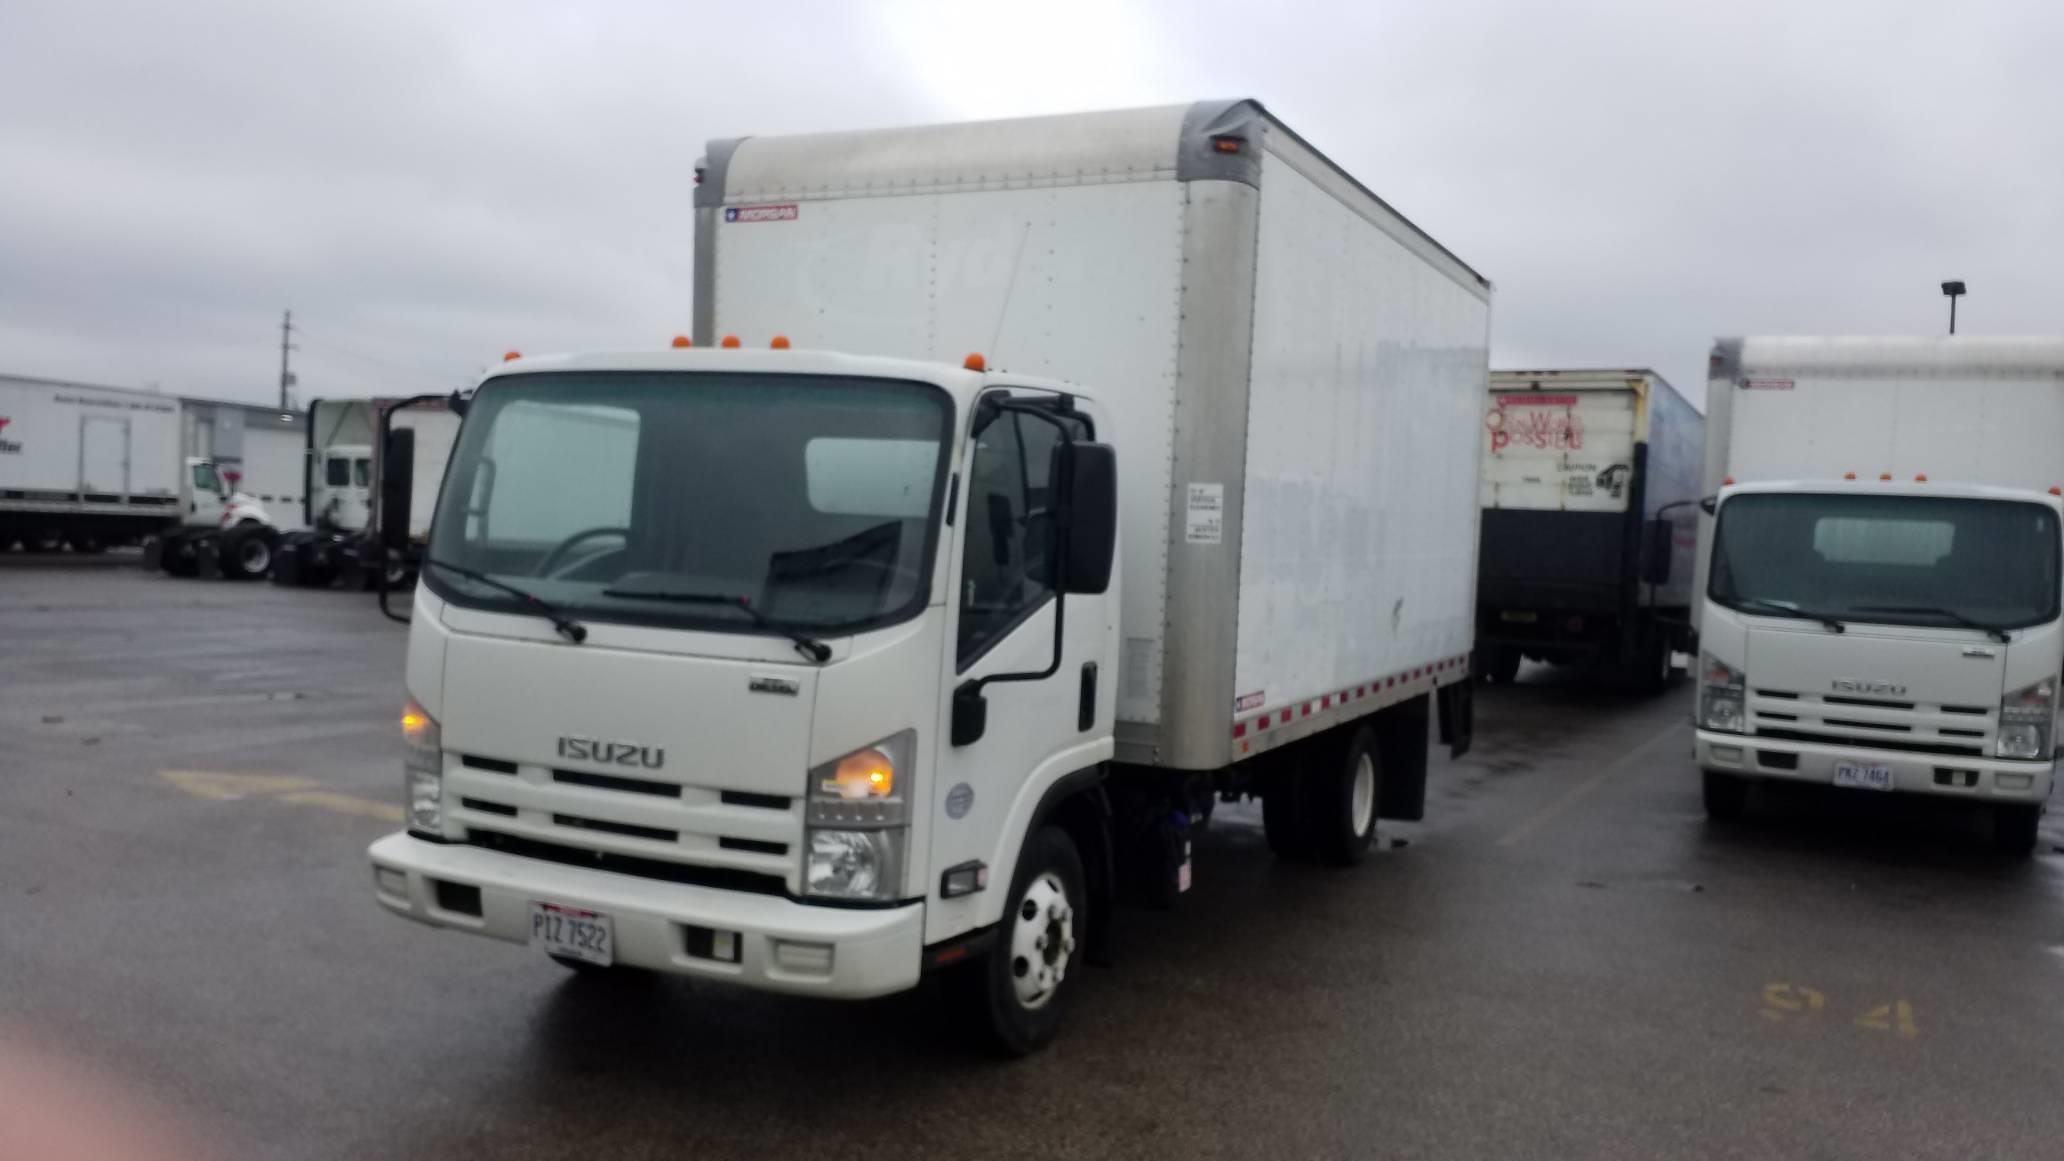 2015 Isuzu NPR-HD Regular Cab 4x2, Dry Freight #644352 - photo 1